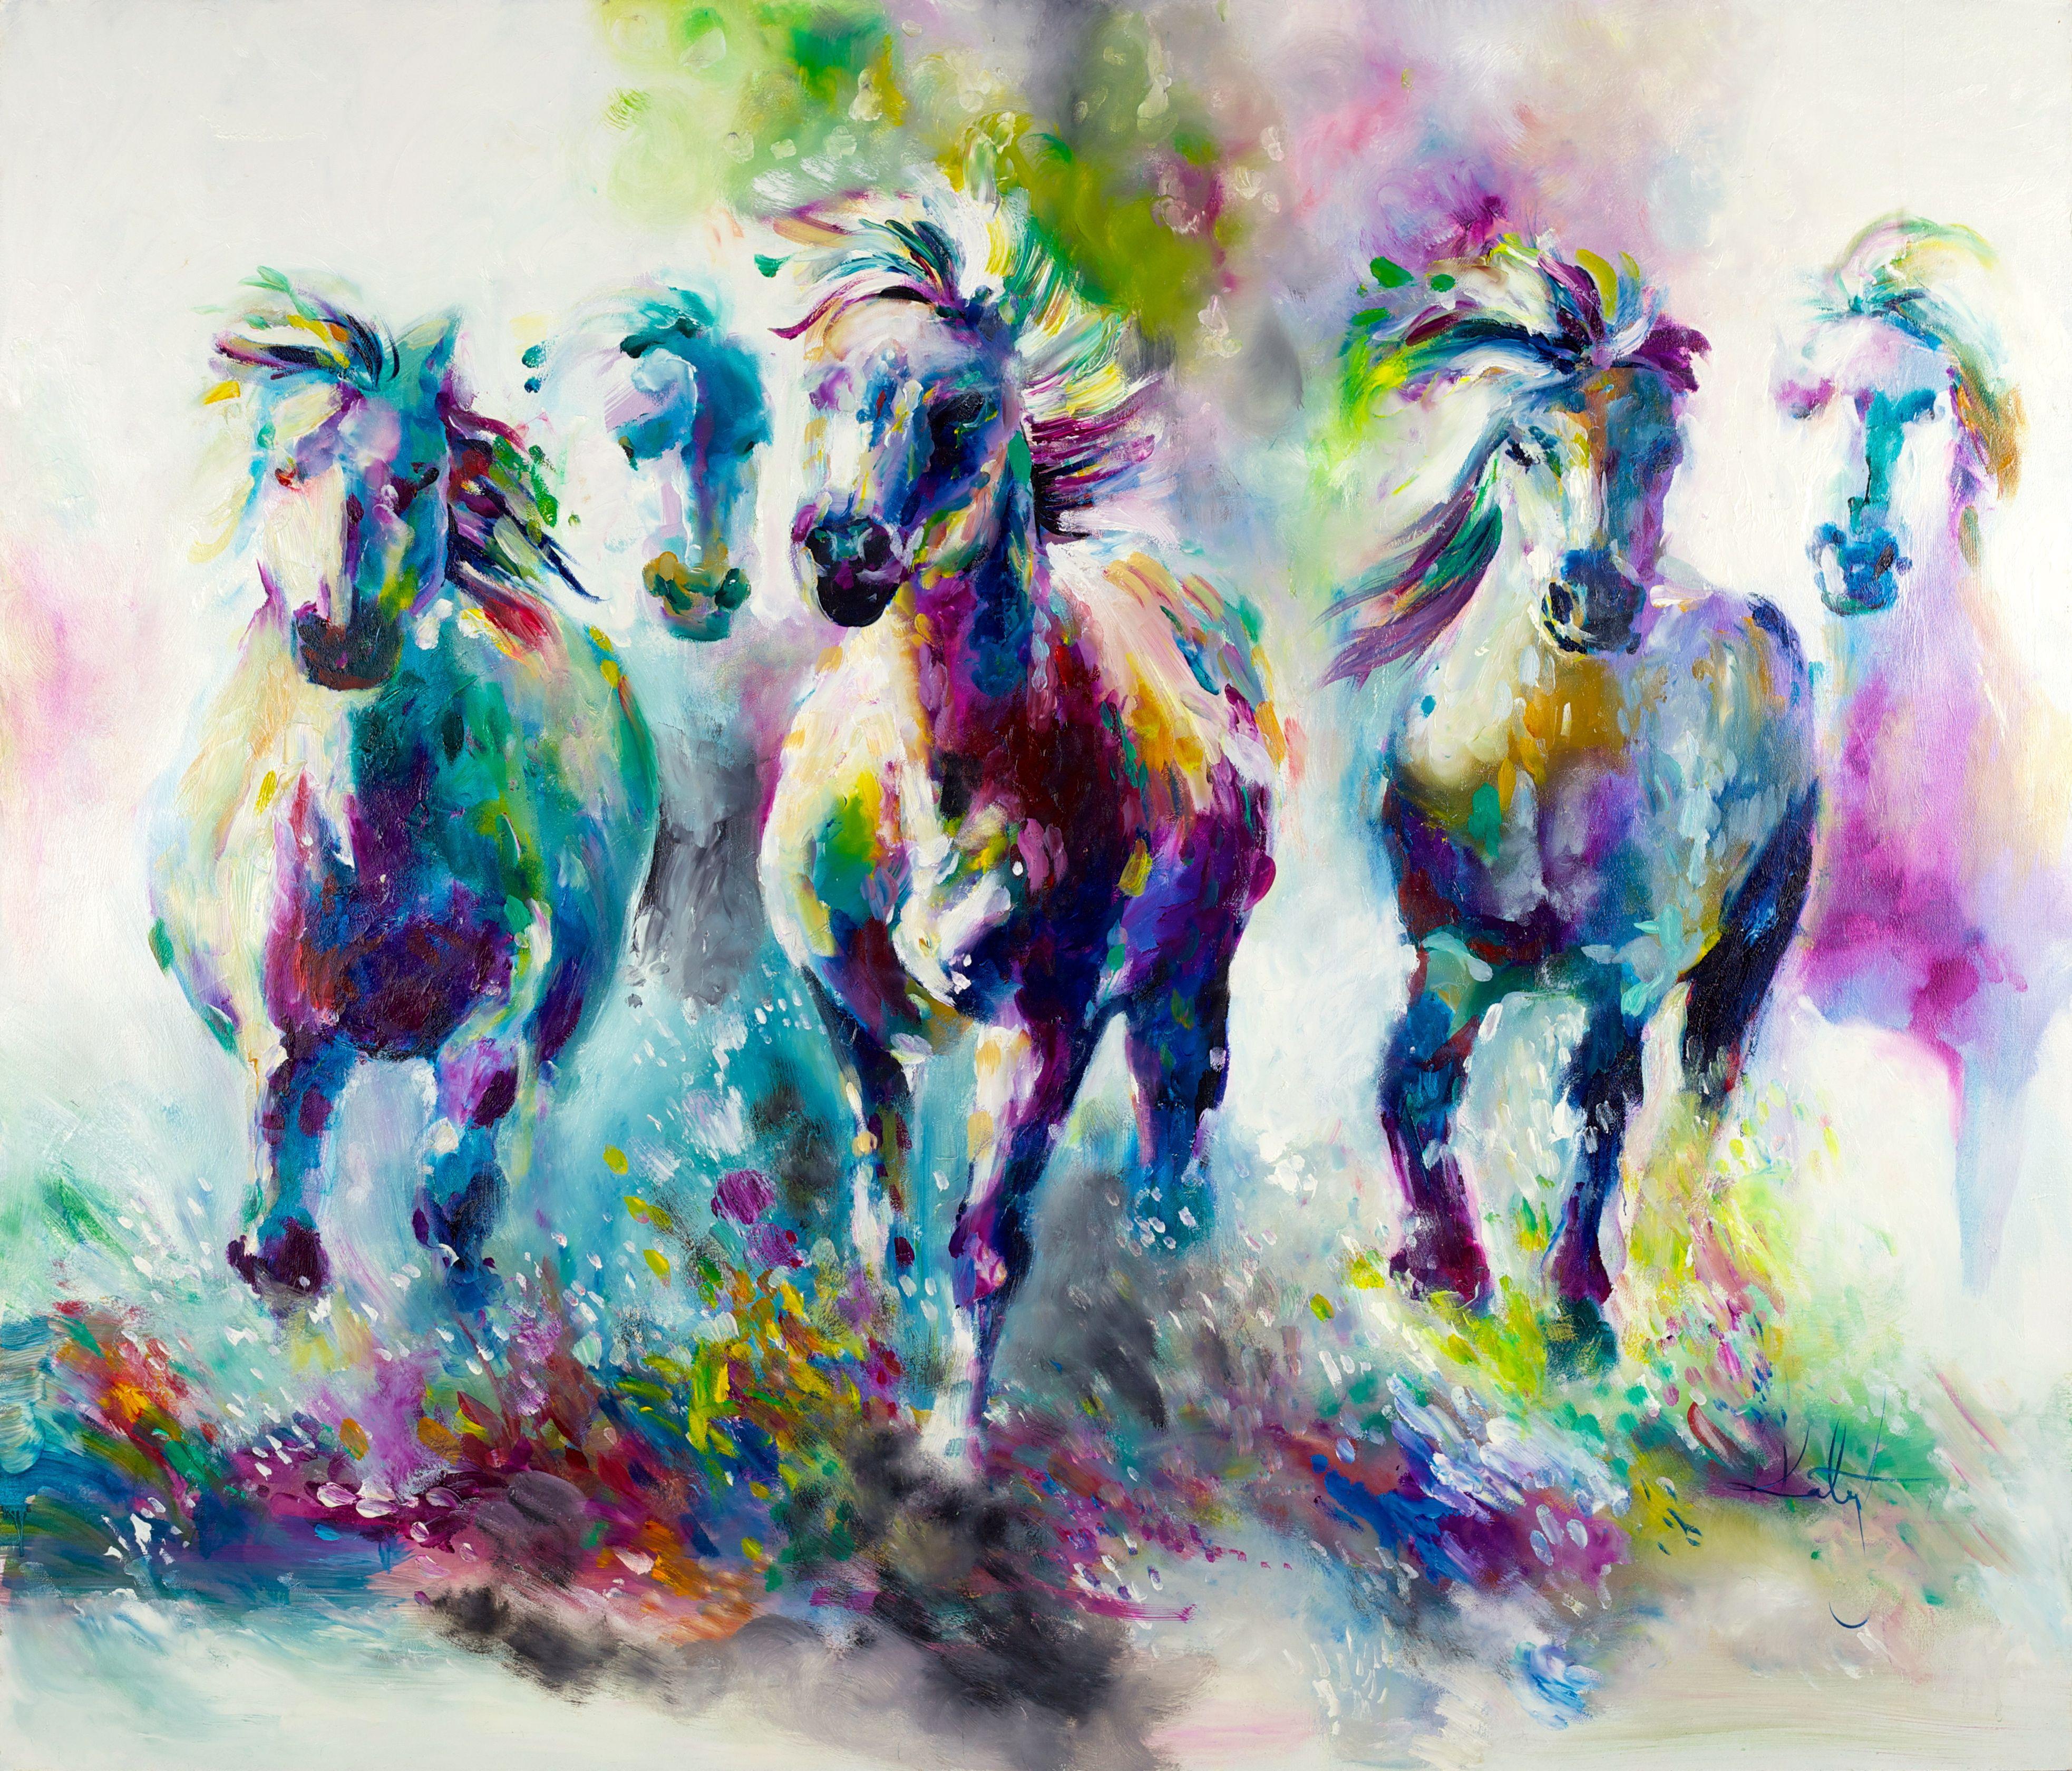 Framelessoil Paintings Canvas Colorful Buddha Sitting Wall: Katy Jade Dobson 'Chroma Equus' Oil Painting